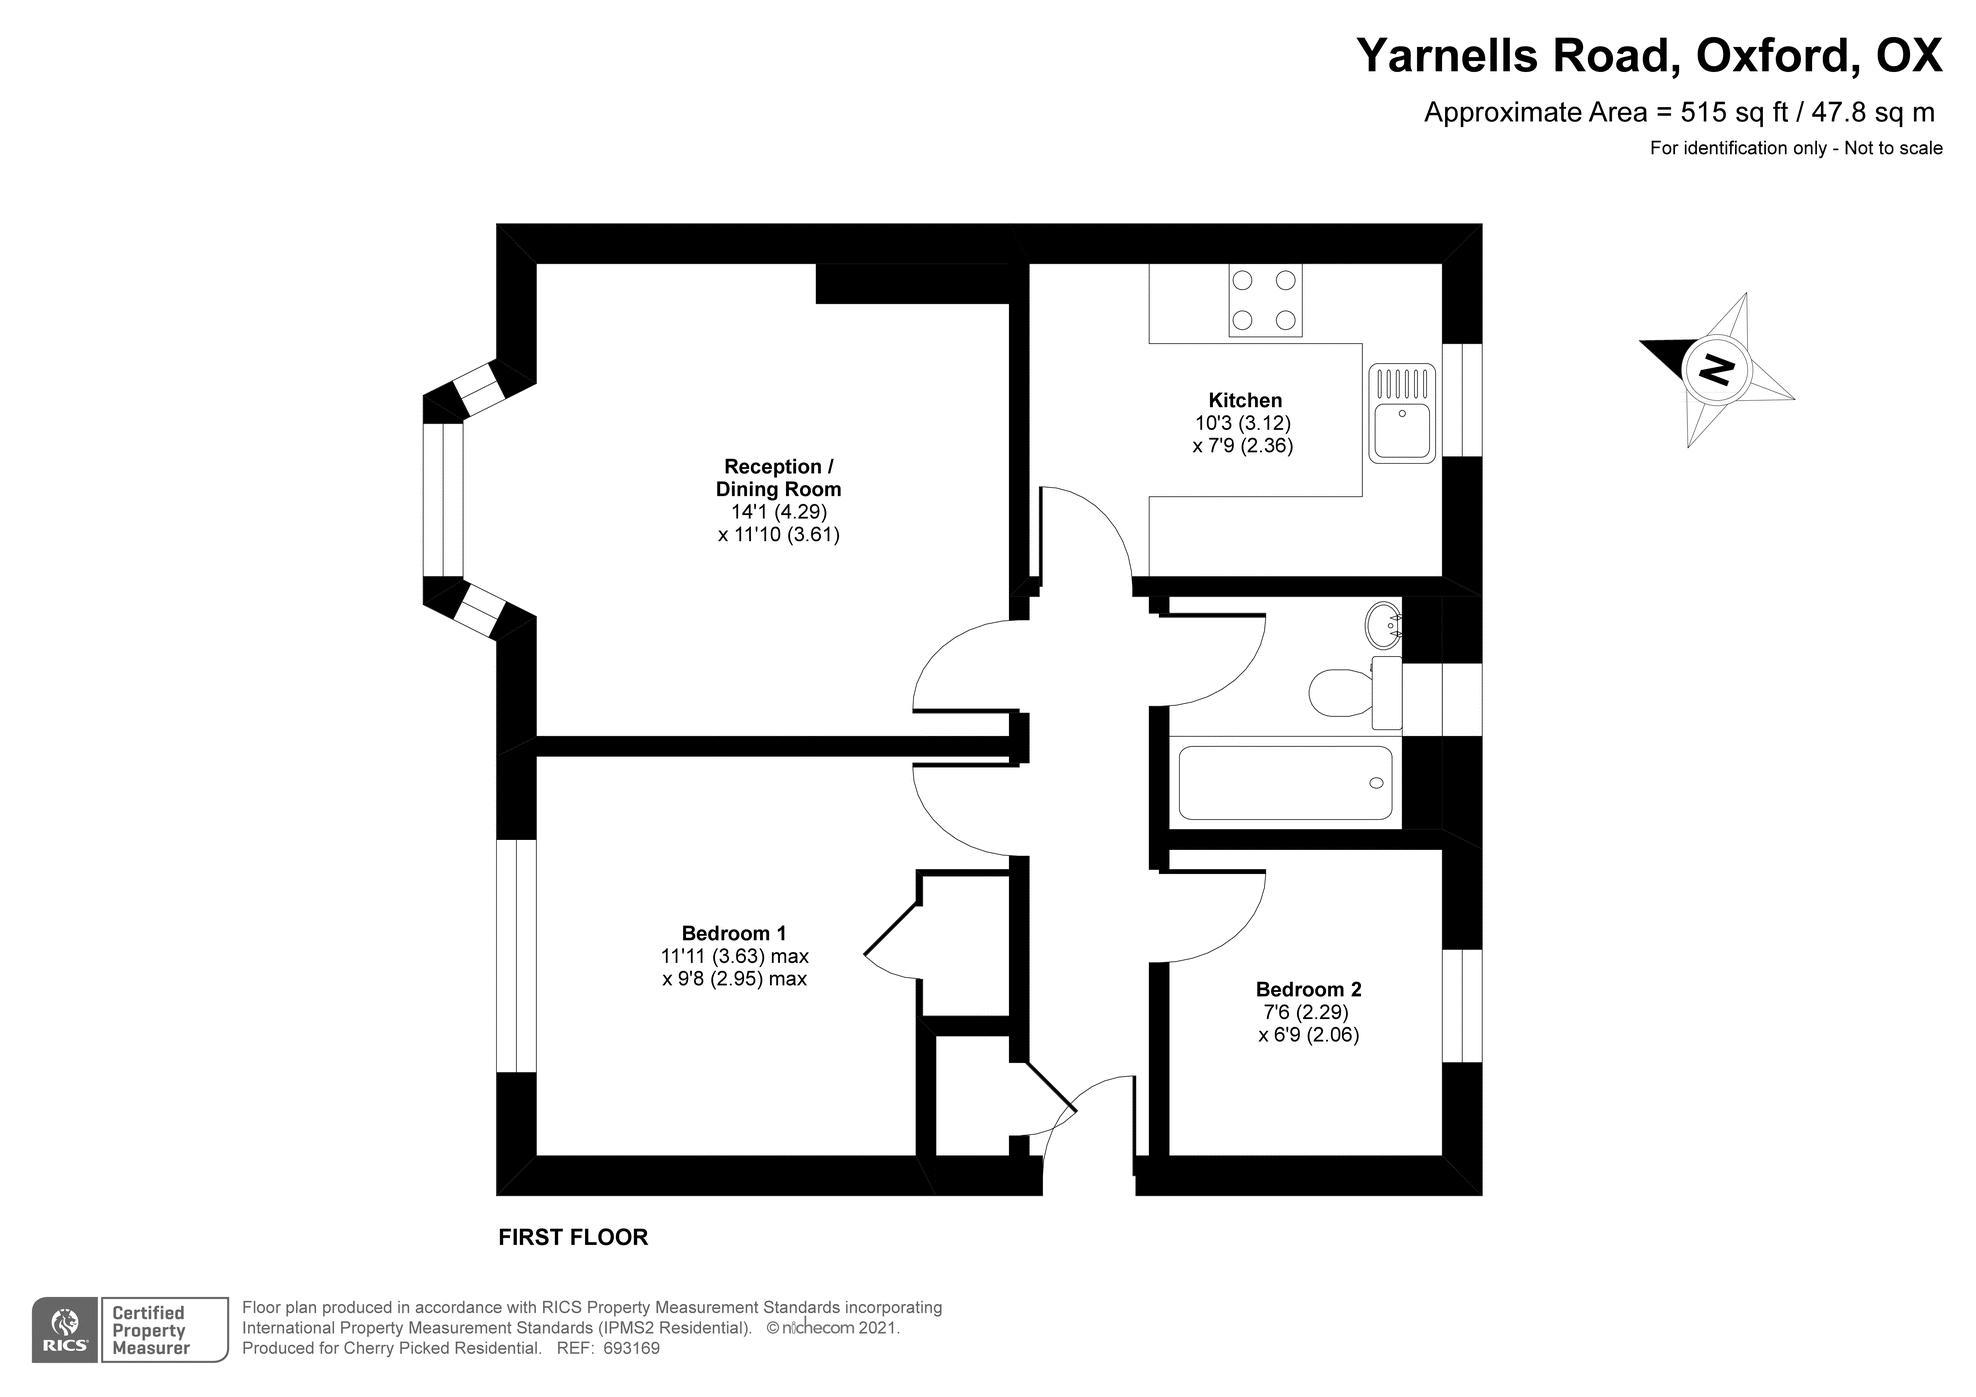 Yarnells Road